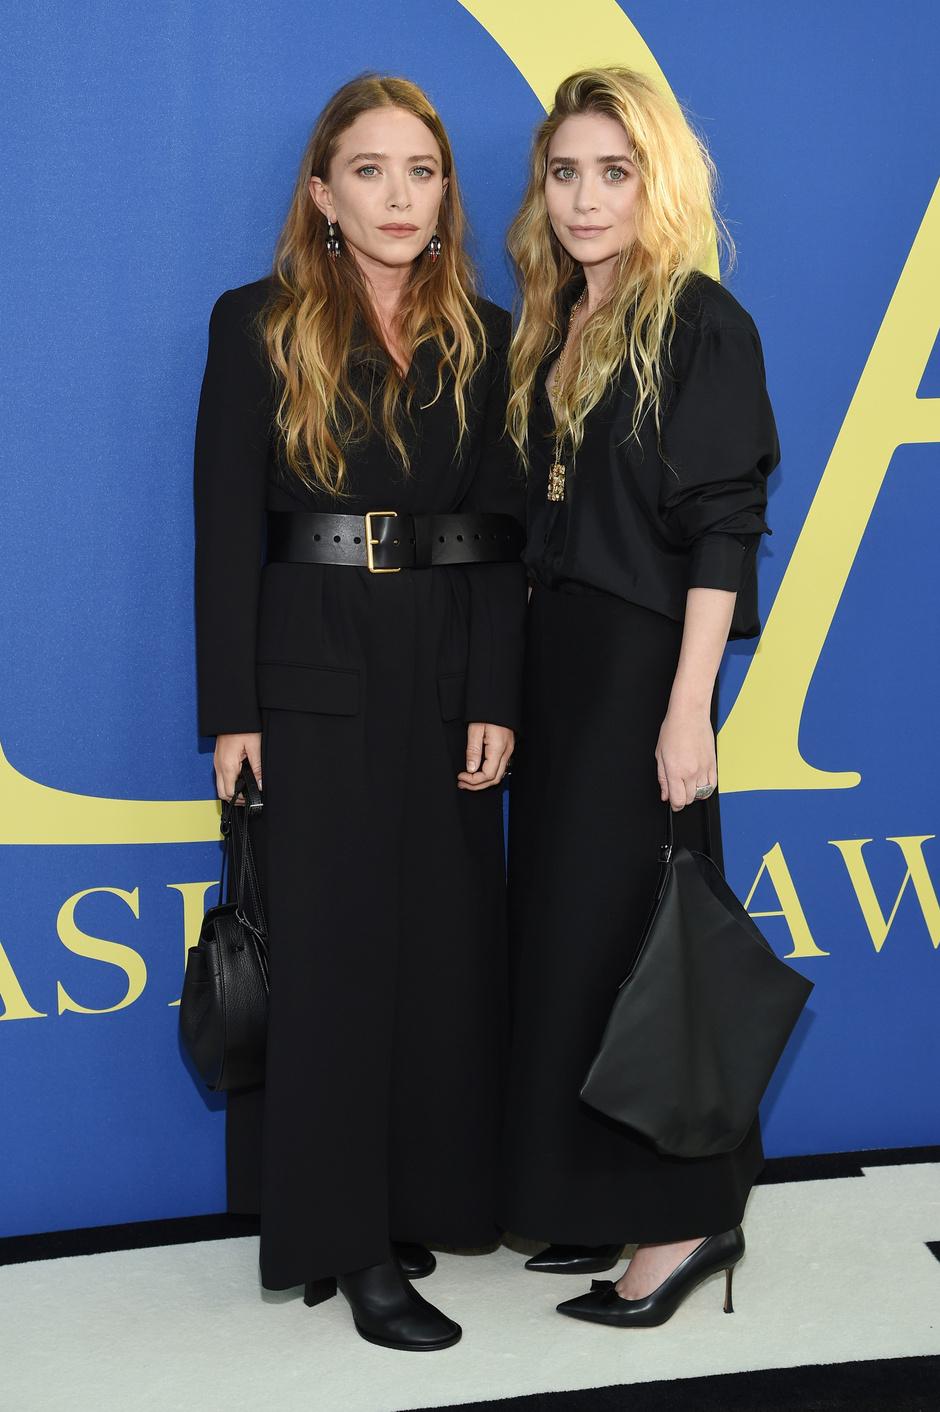 Olsen twin fashion line 18